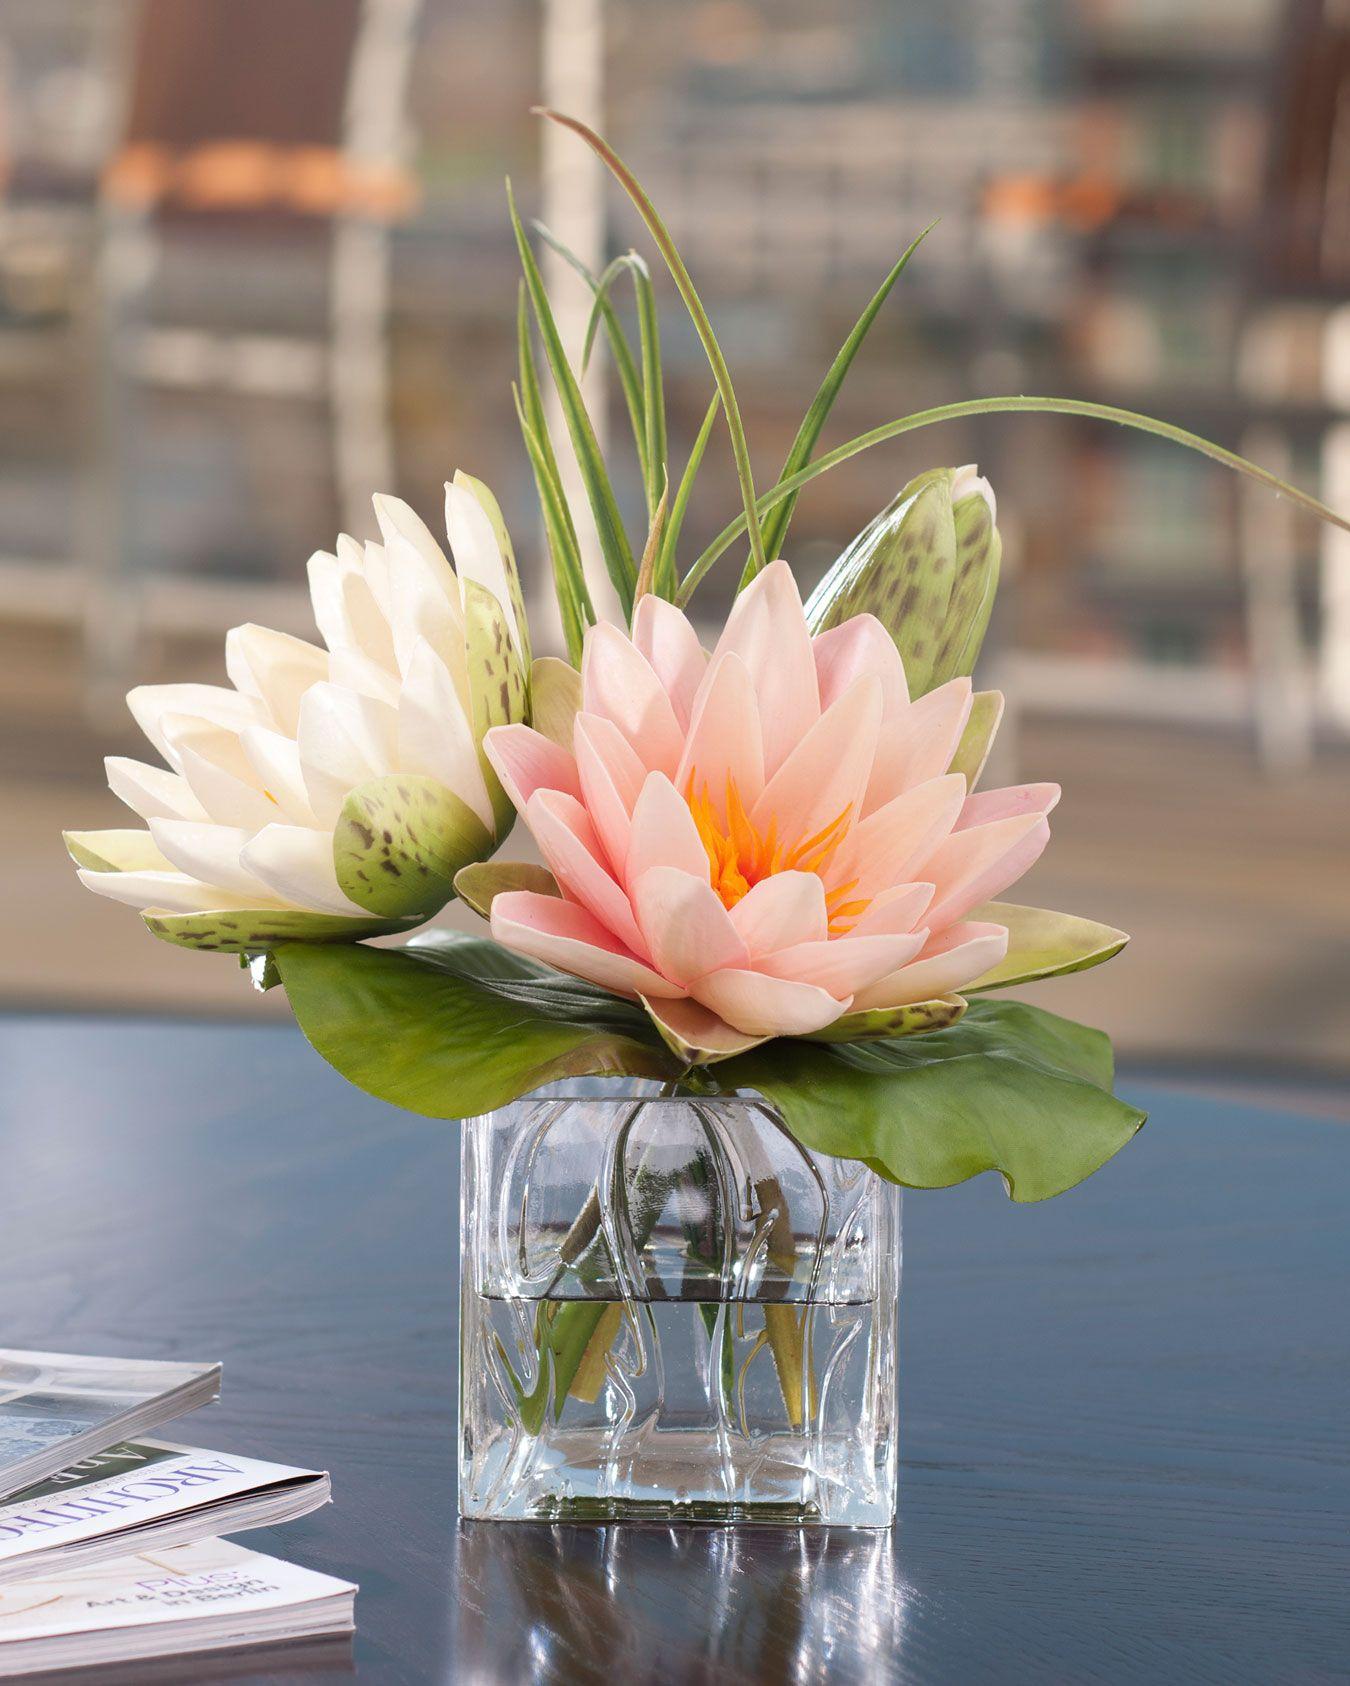 Lotus Blossom Lily Padsilk Flower Arrangement F L O R A L